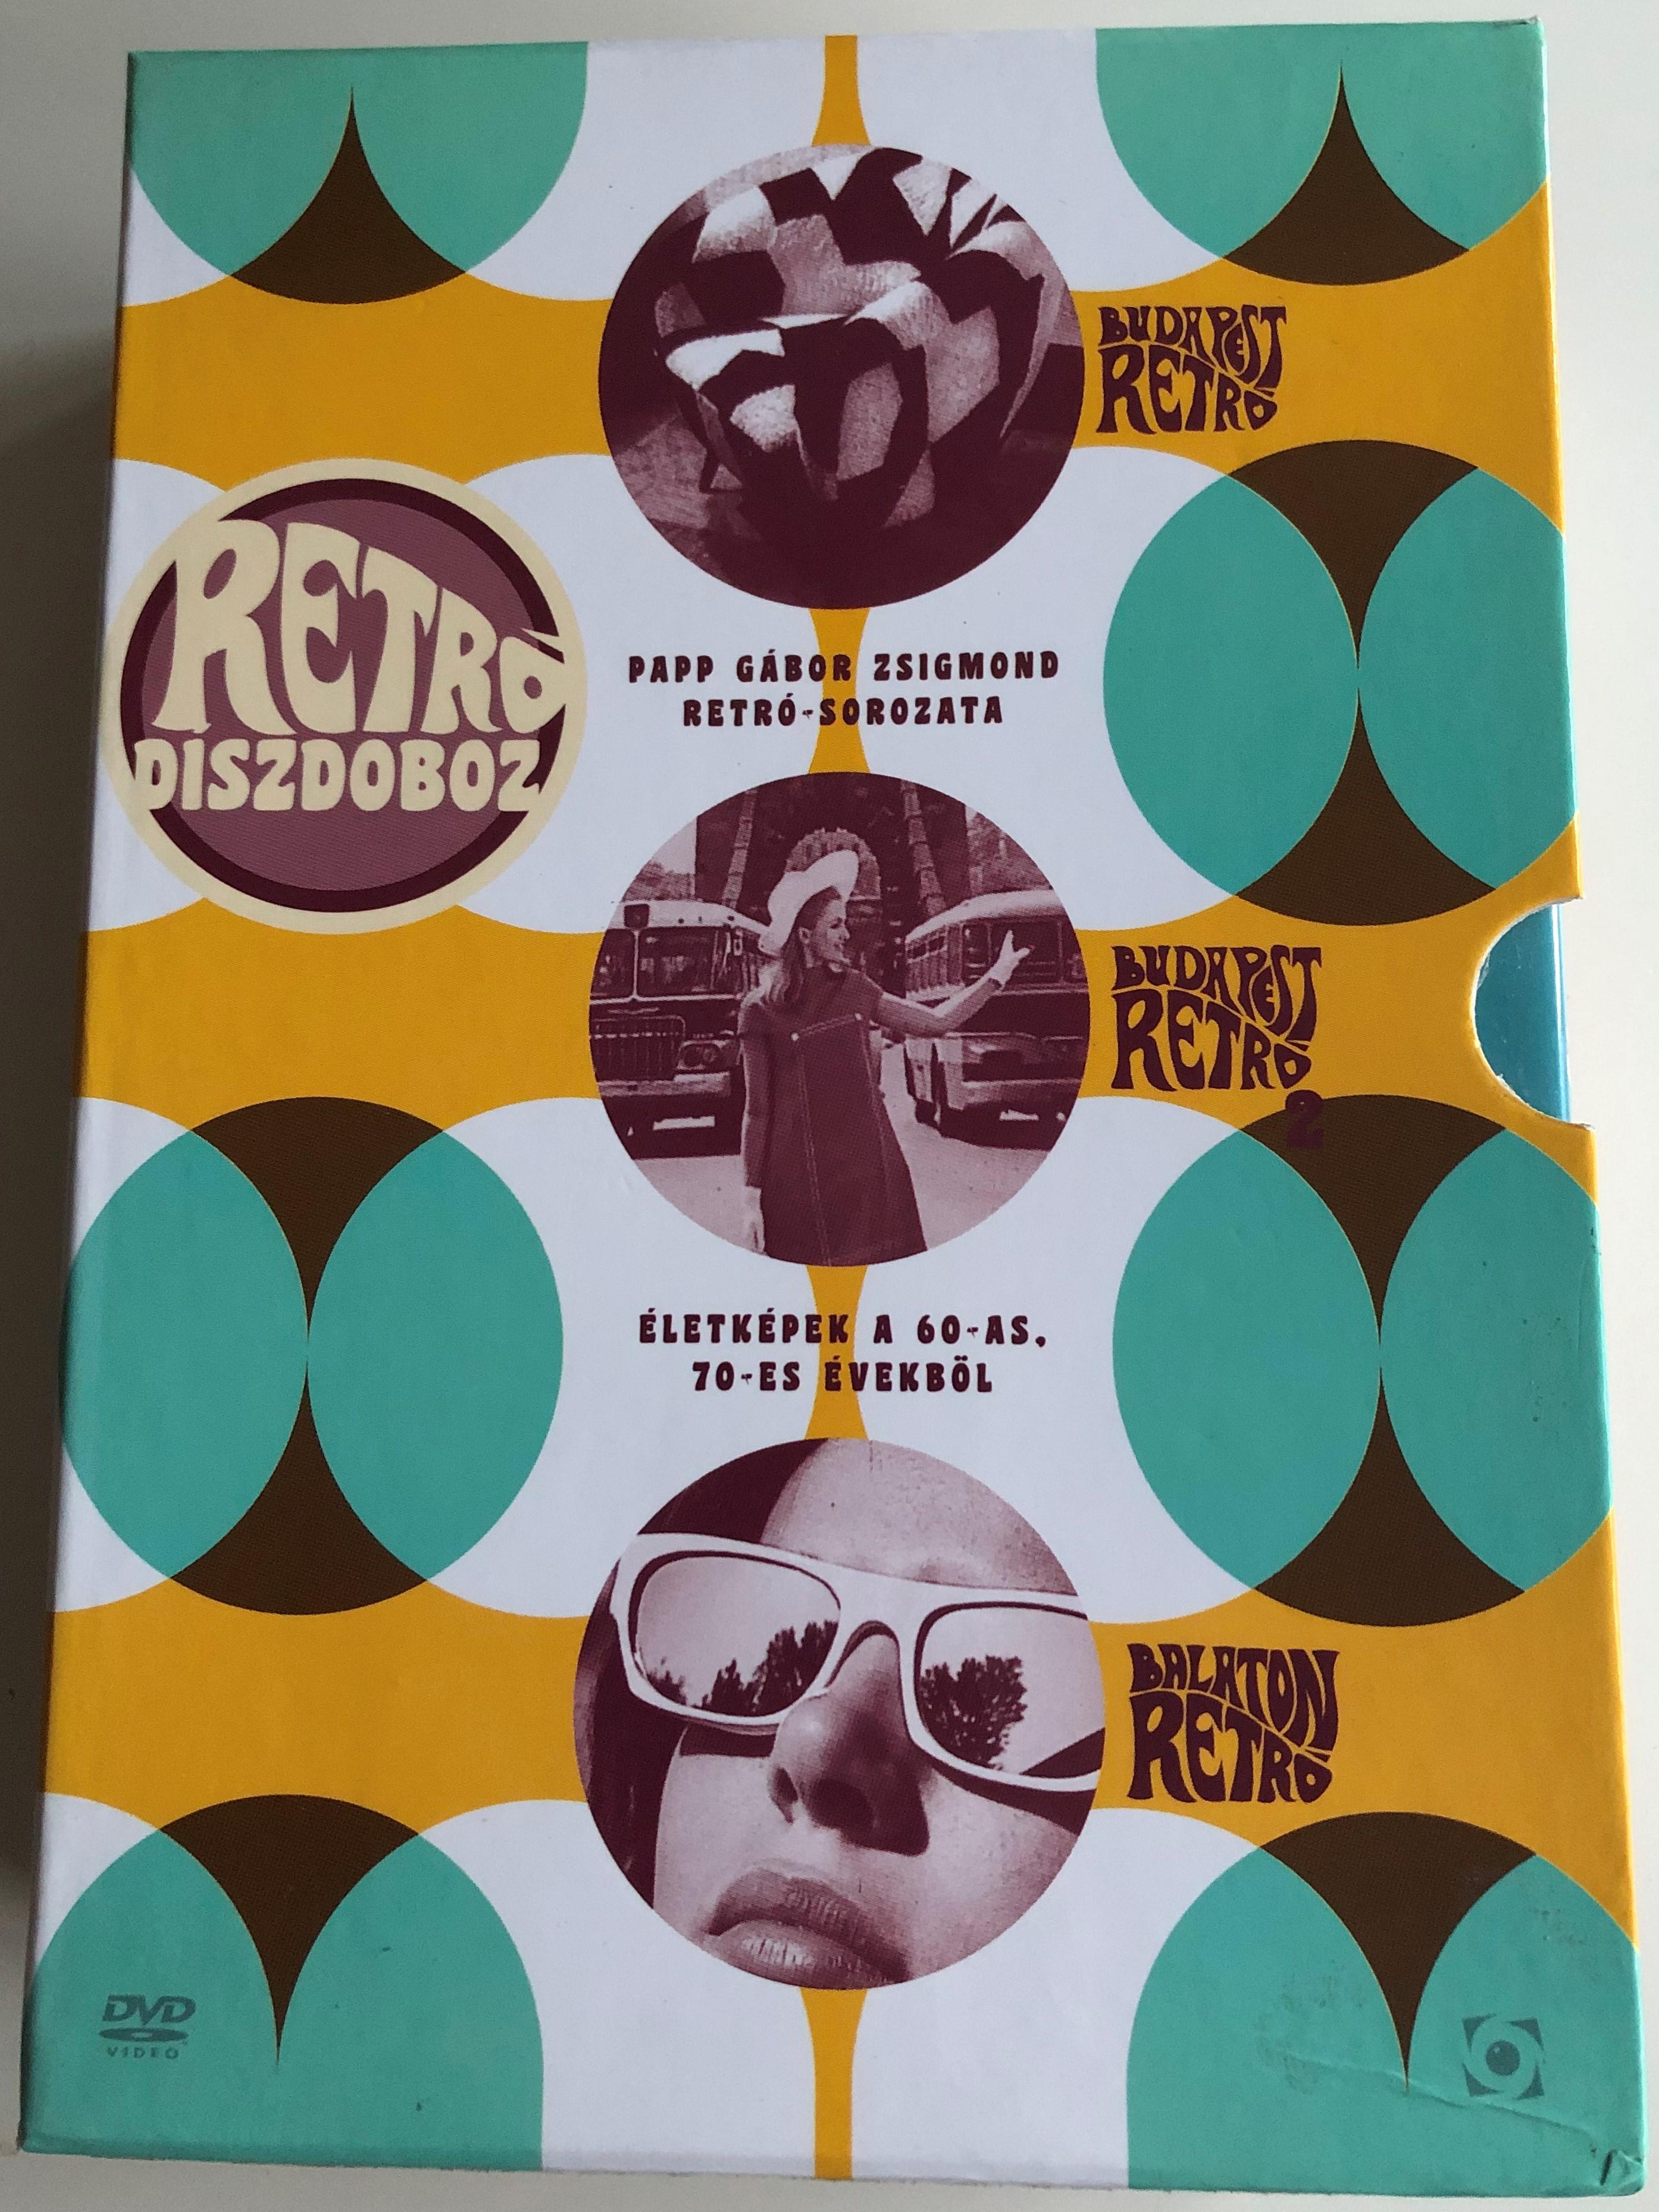 retr-d-szdoboz-dvd-box-papp-g-bor-zsigmond-retr-sorozata-1.jpg